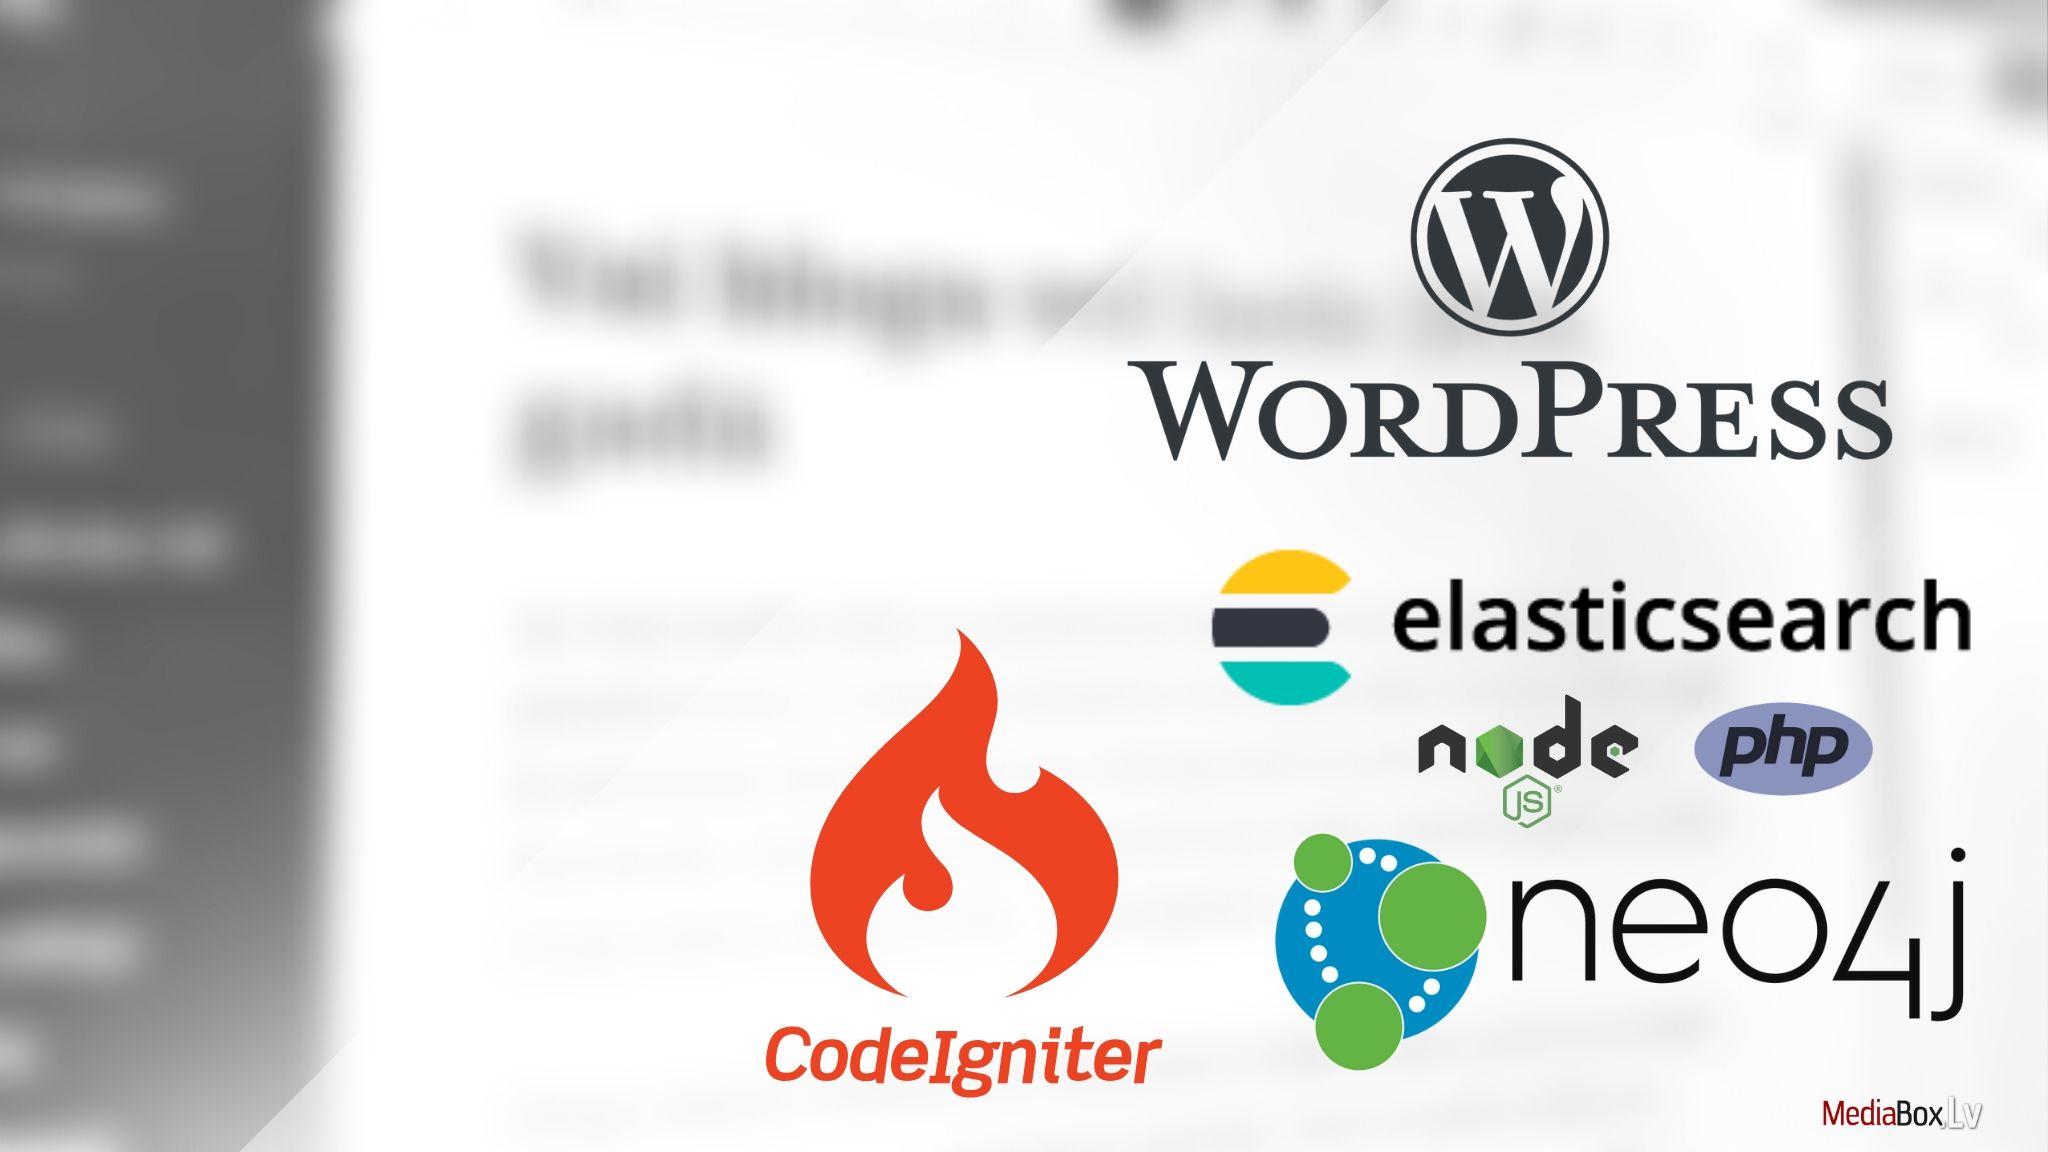 web izstrade: PHP, Node.js, WordPress, Neo4j, Codeigniter, Elasticsearch